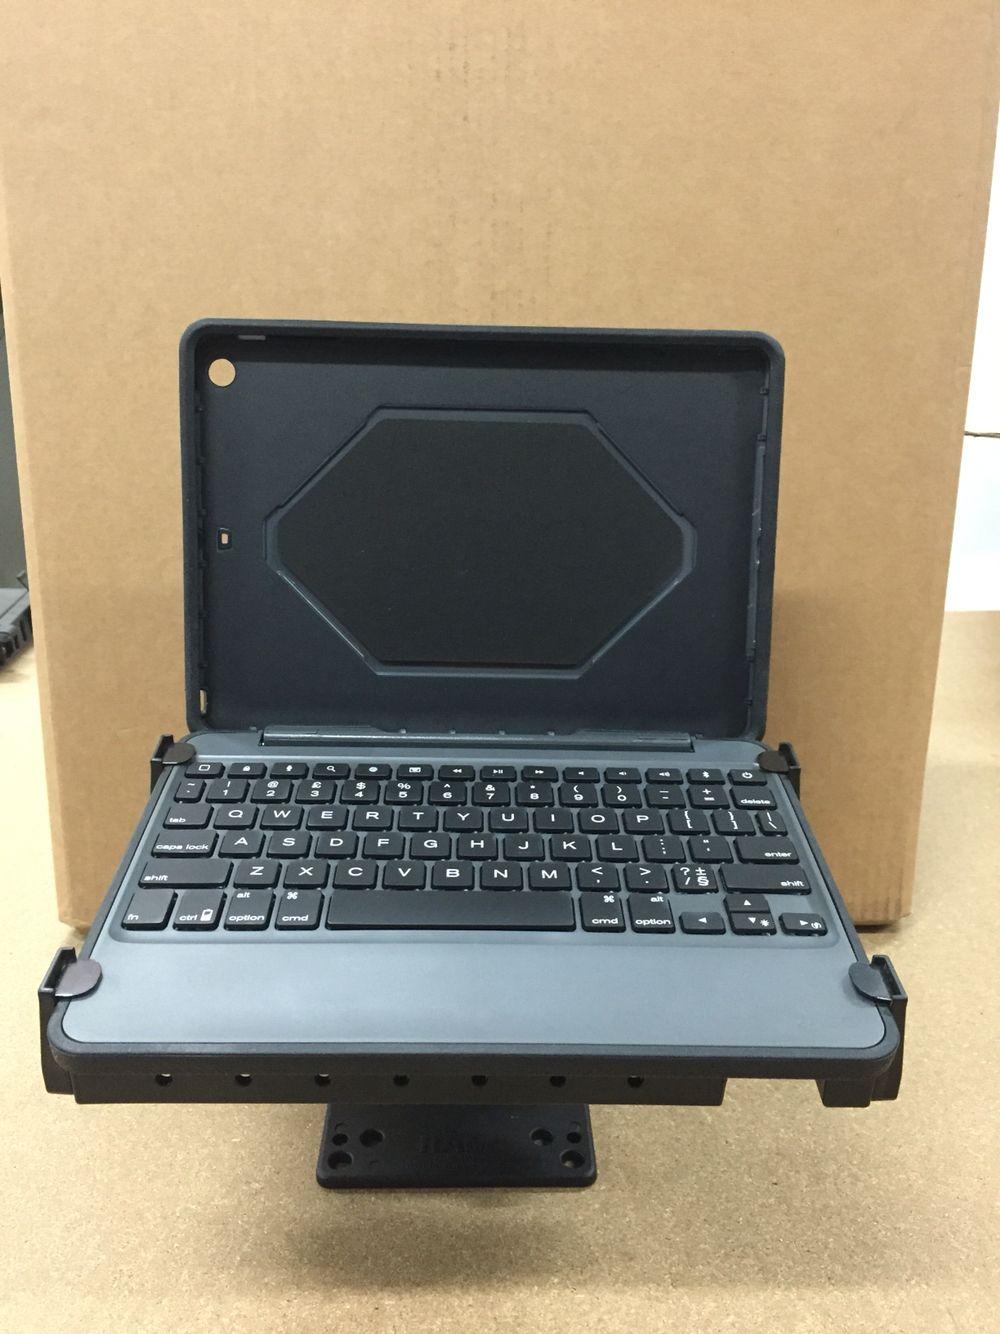 Zagg Rugged Ipad Air Keyboard Case Perfect Mounted On Ram Mount Toughtray Ipad Air Keyboard Case Ipad Mount Keyboard Case